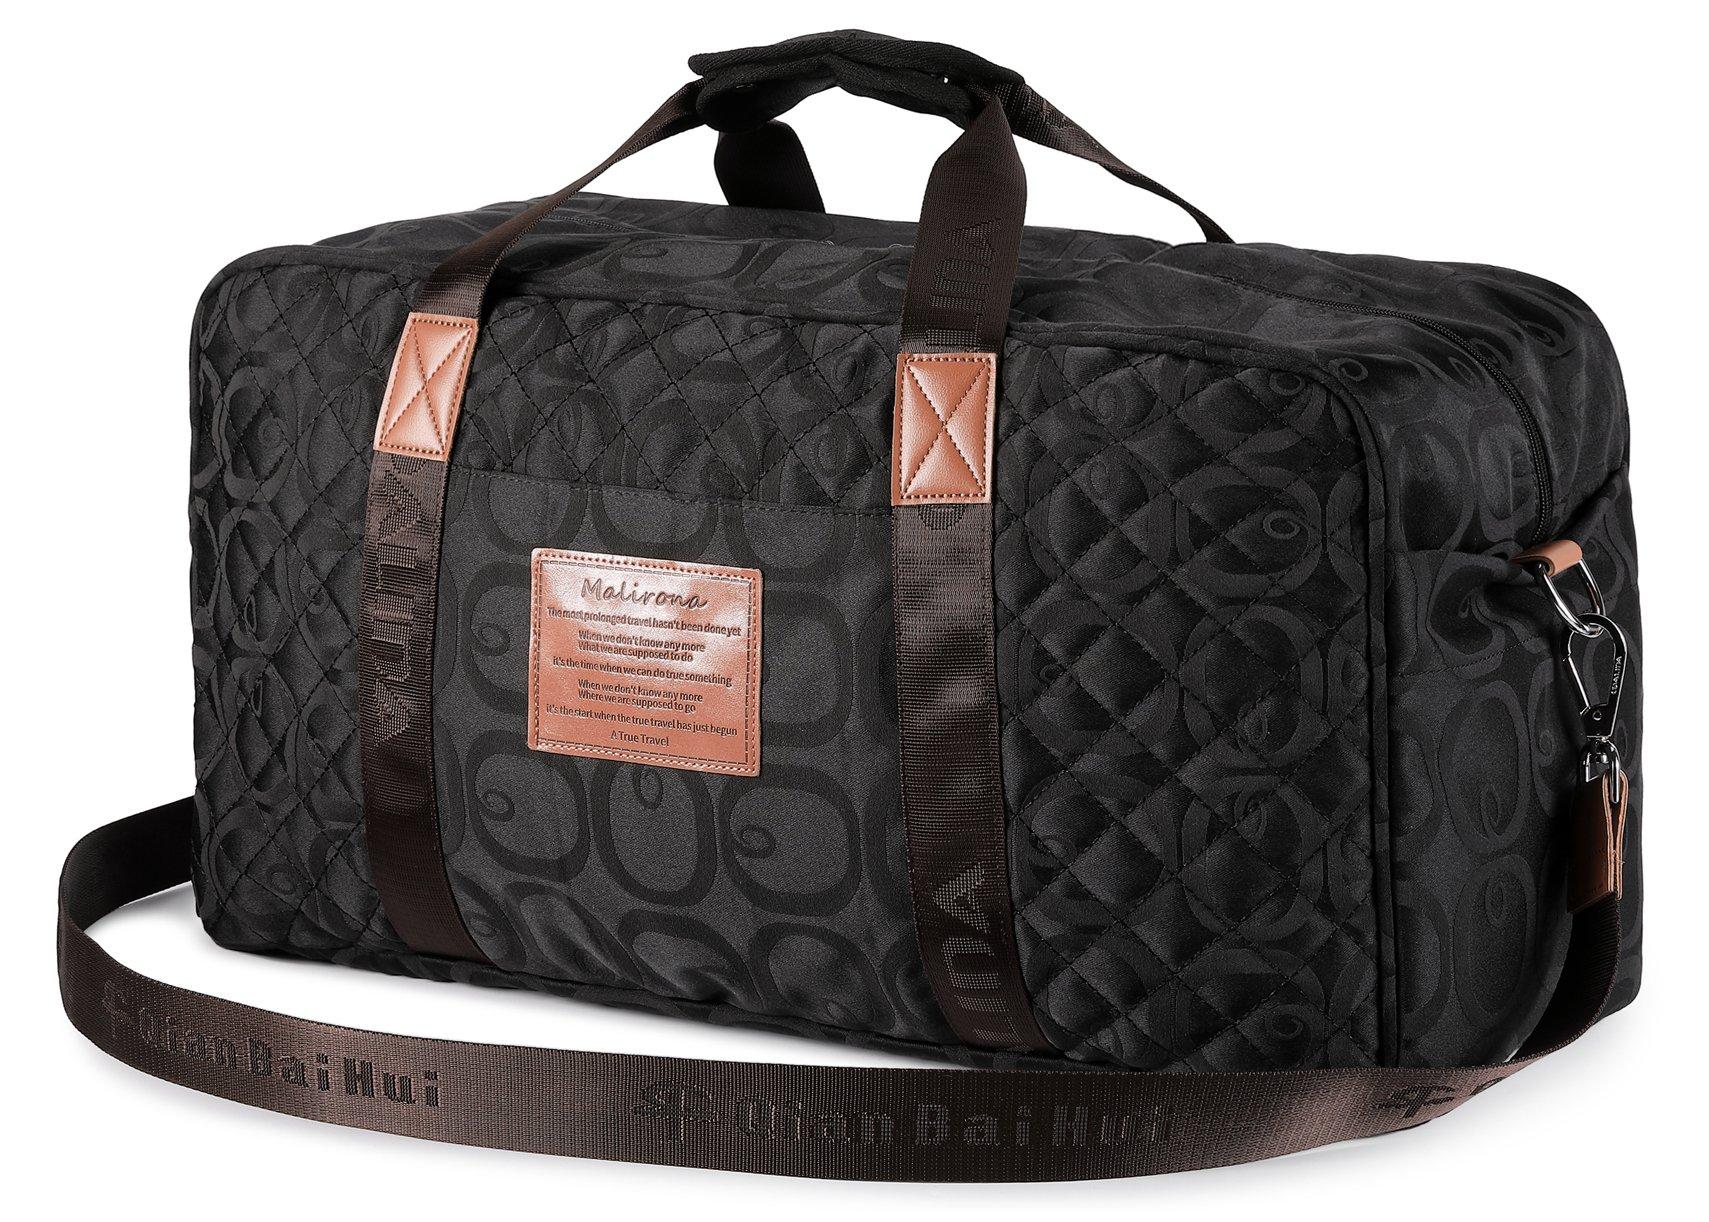 Malirona Canvas Weekender Bag Travel Duffel Bag for Weekend Overnight Trip (Seasonal Flowers Black)